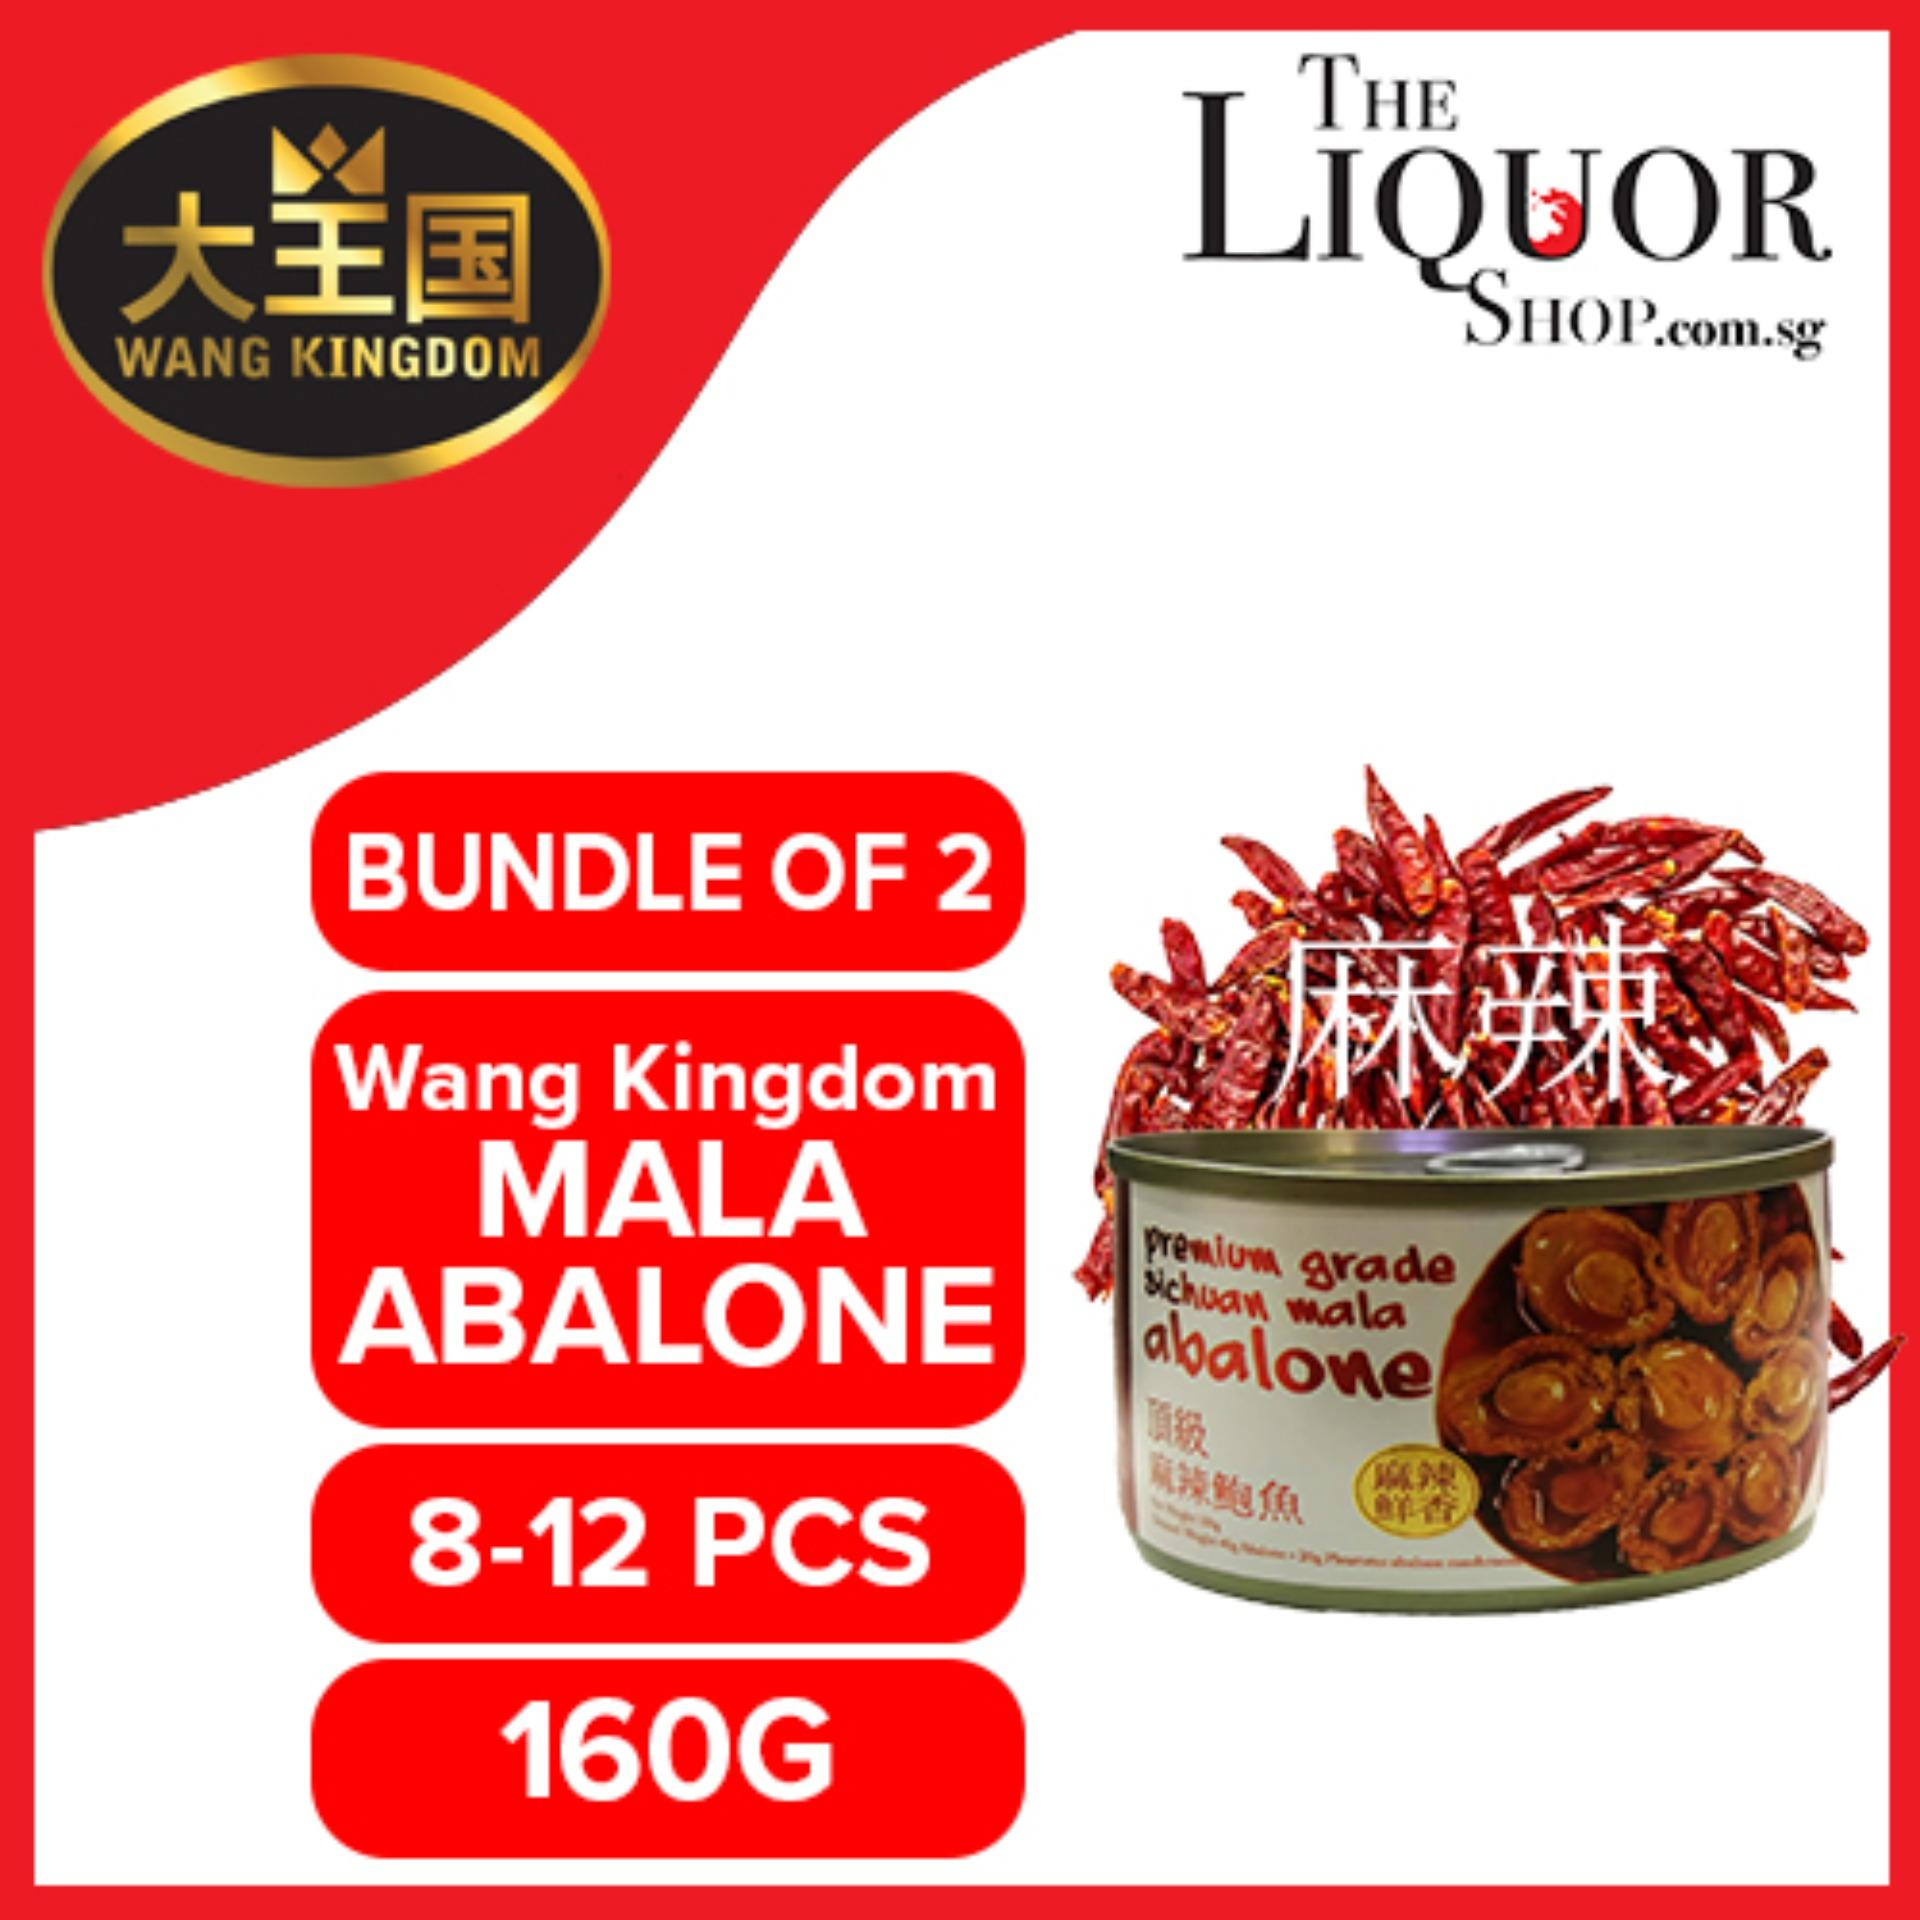 Bundle Of 2 Wang Kingdom Mala Abalone By The Liquor Shop